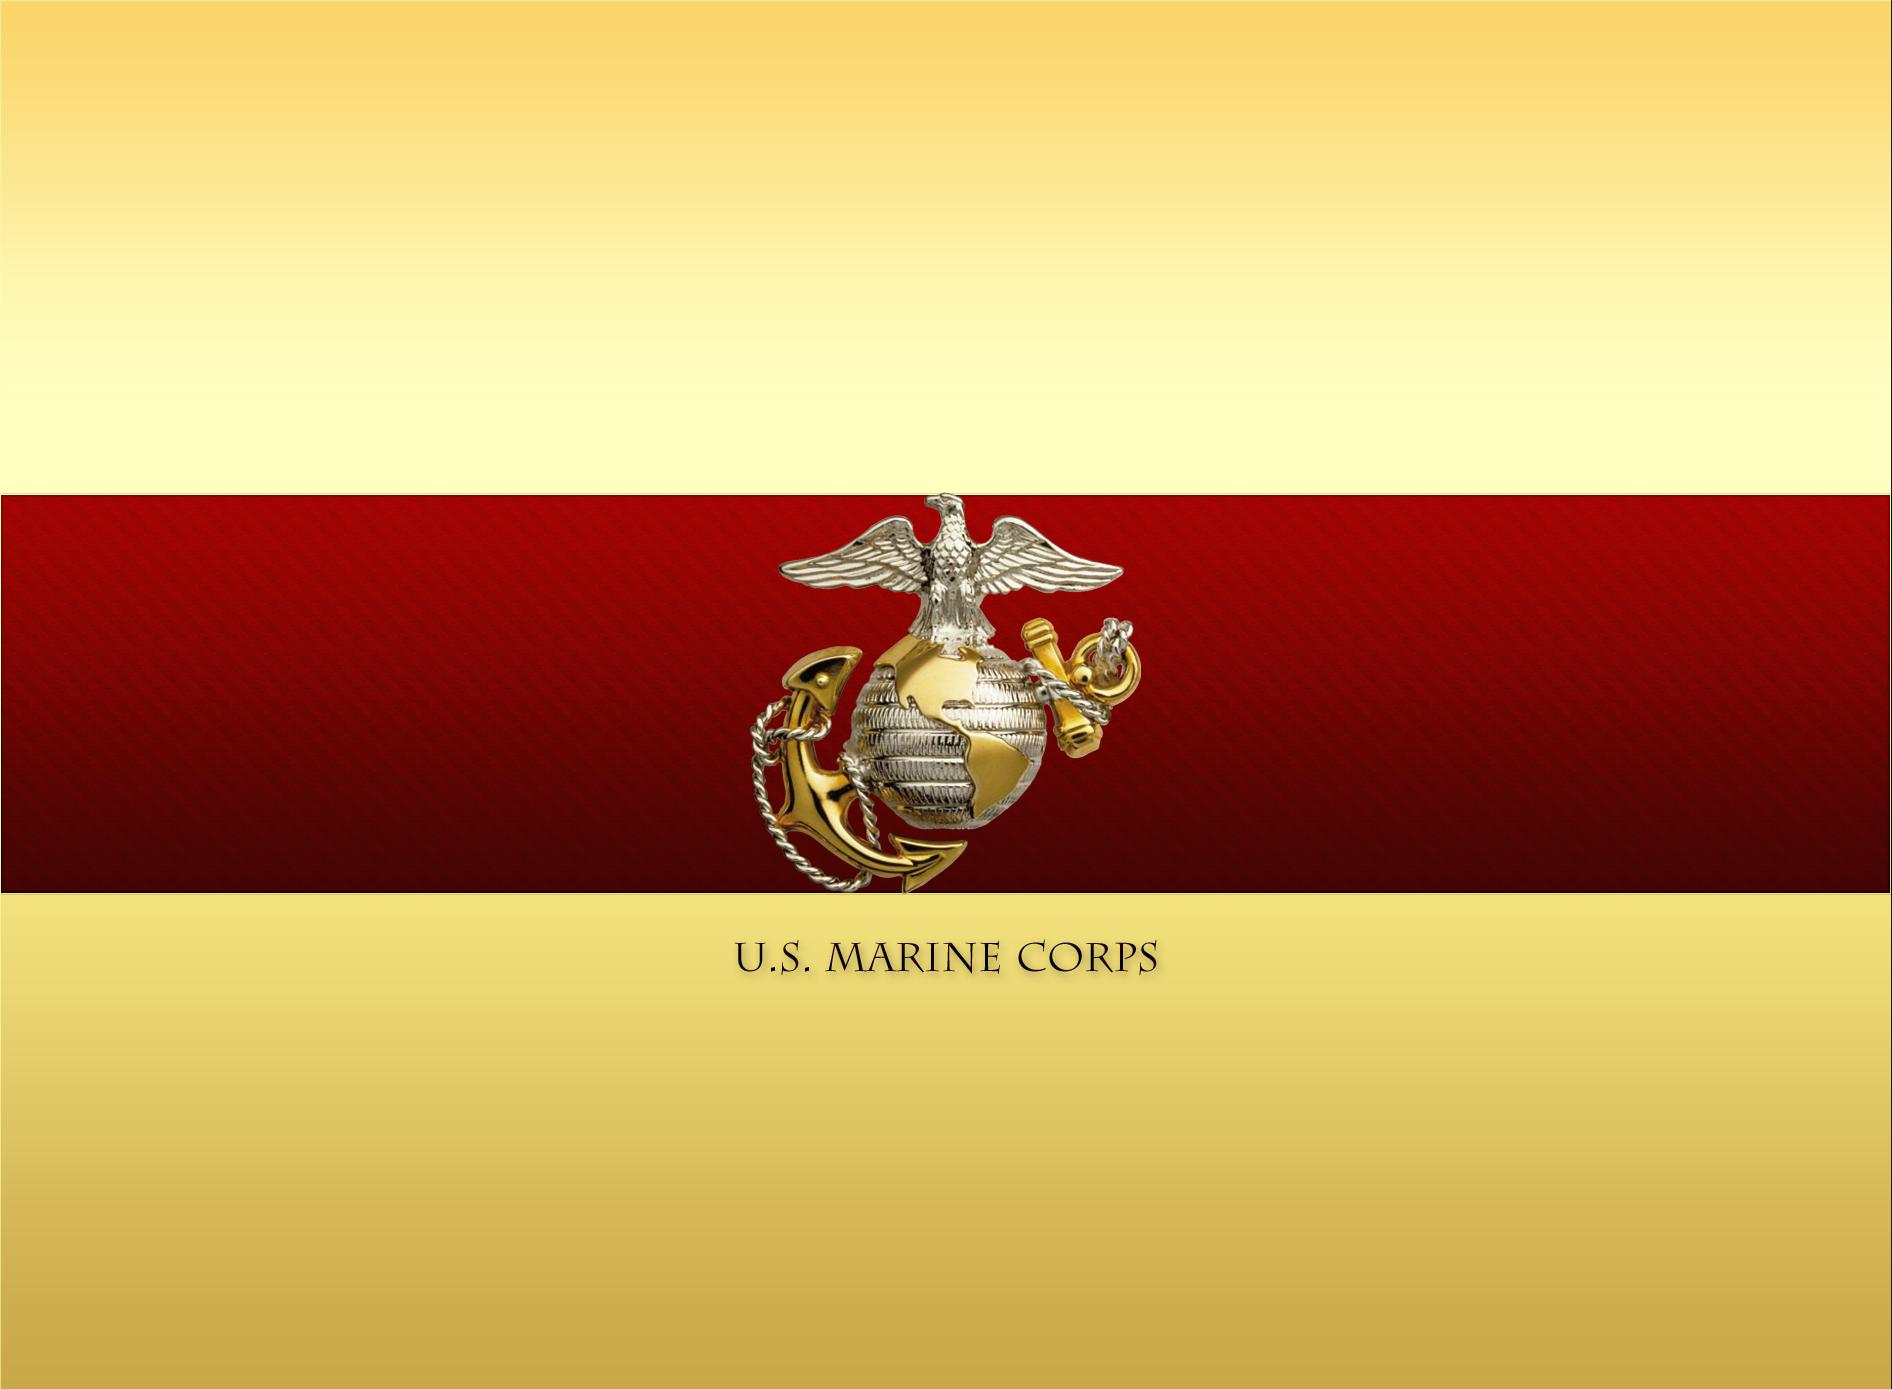 USMC Wallpaper 911418 USMC Wallpaper 911344 USMC Wallpaper 911407 1892x1389